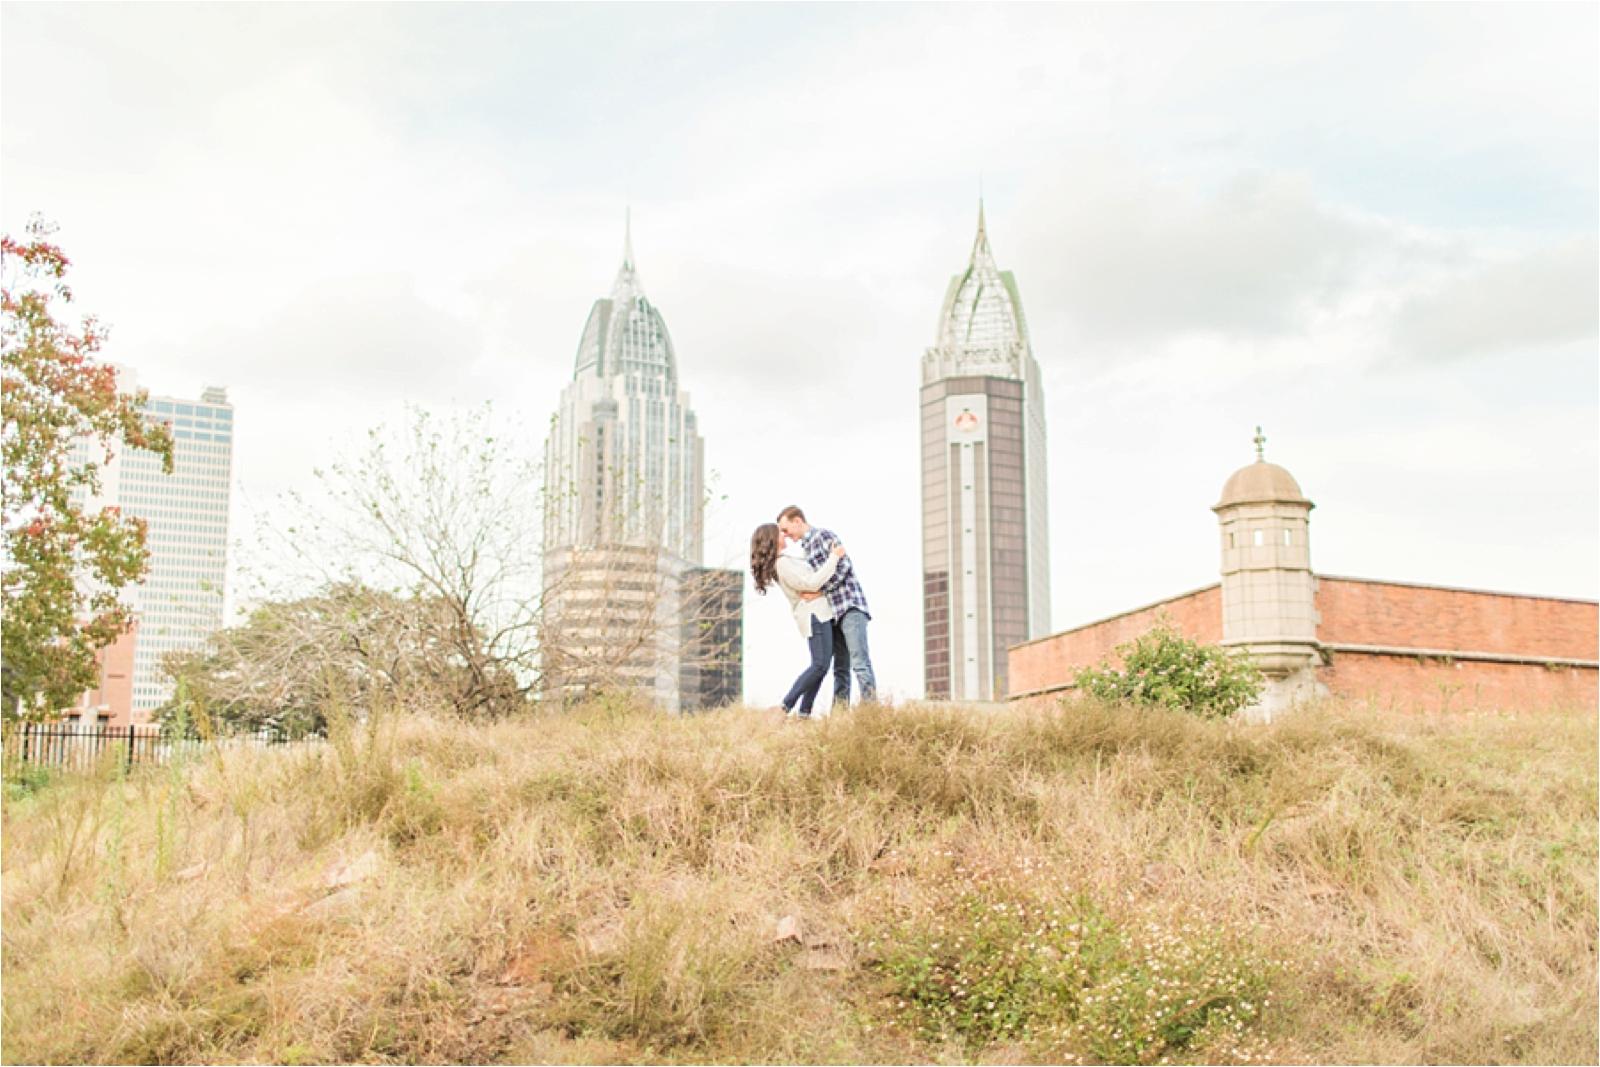 Mobile Alabama Engagement Session Photographer